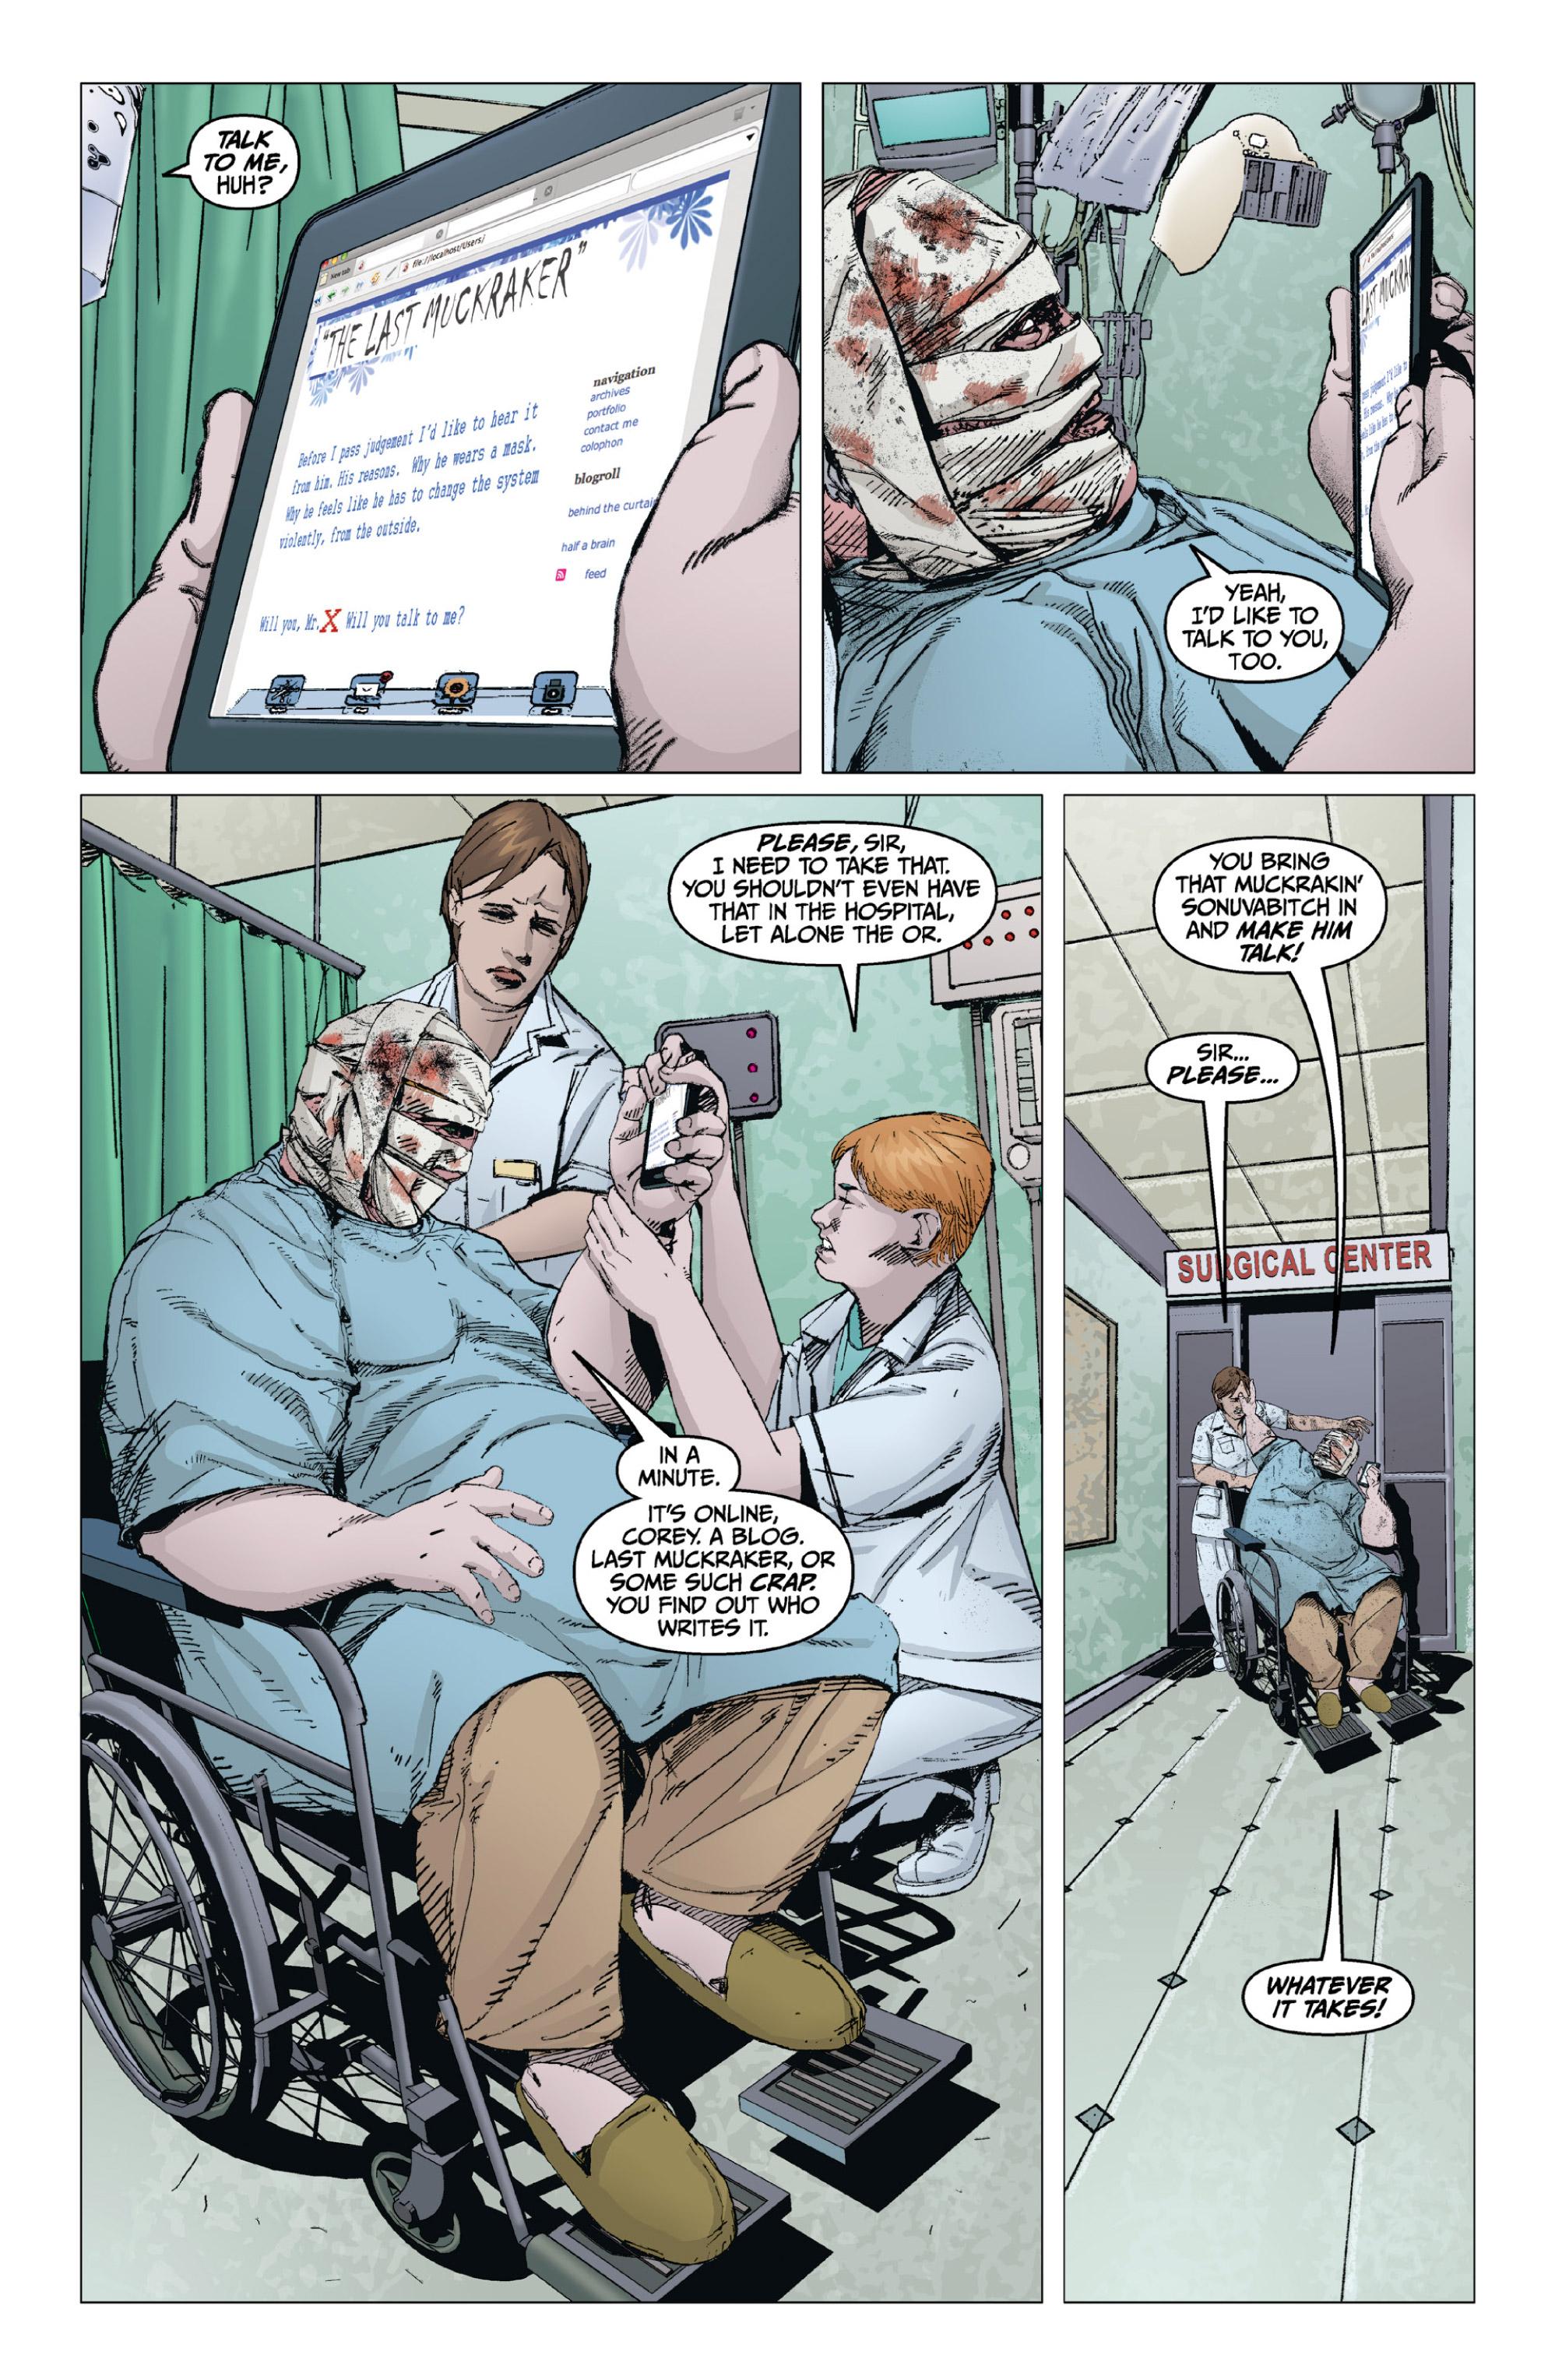 Read online X: Big Bad comic -  Issue # Full - 77